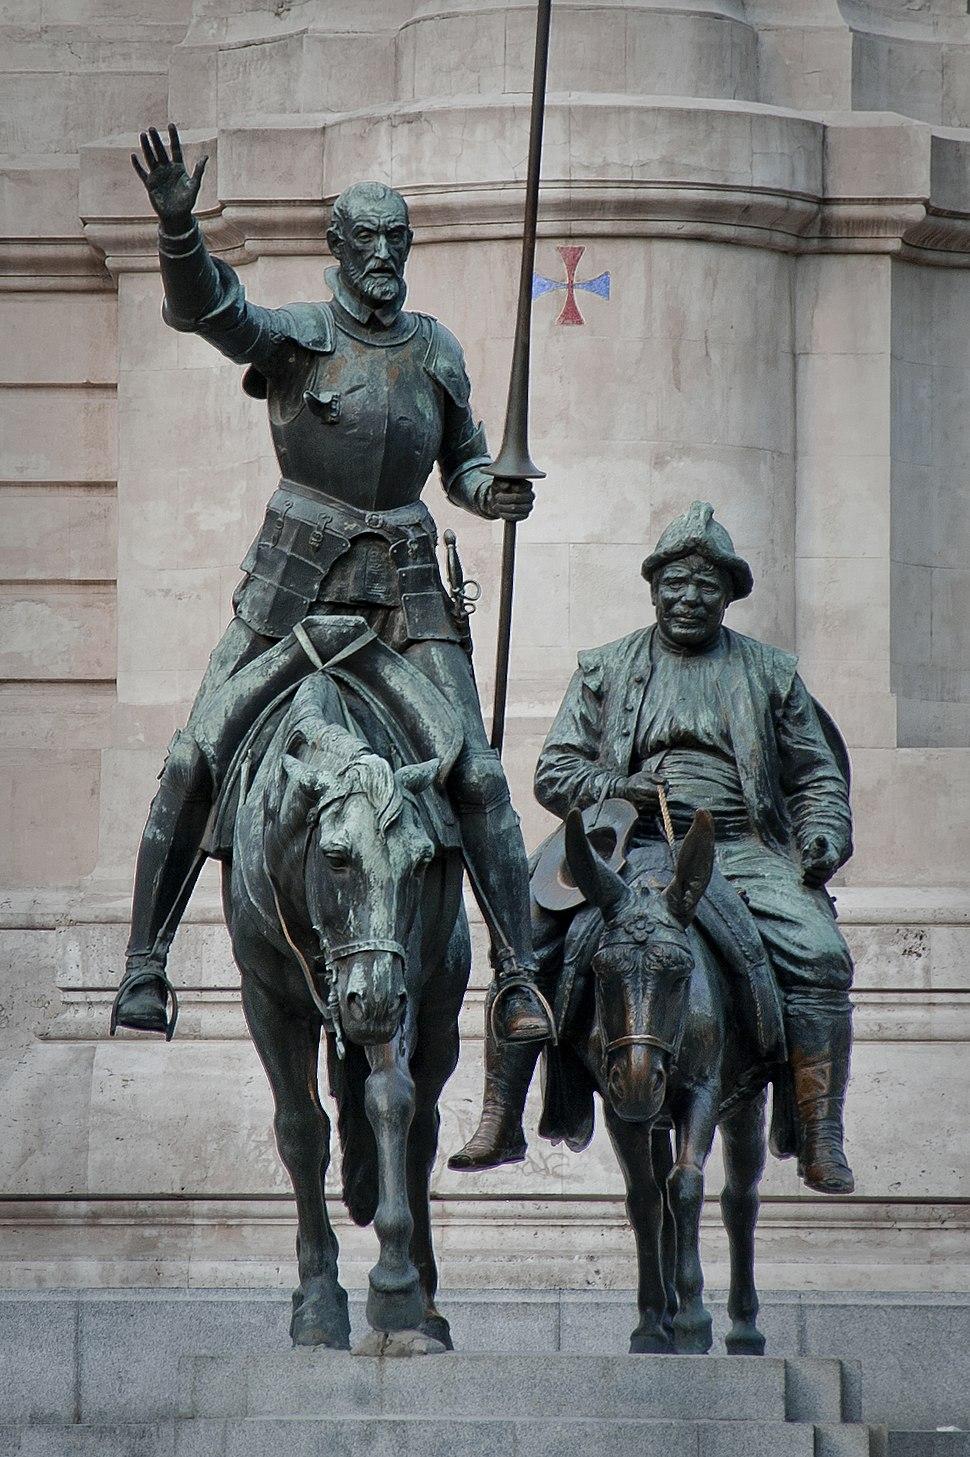 Bronze statues of Don Quixote and Sancho Panza